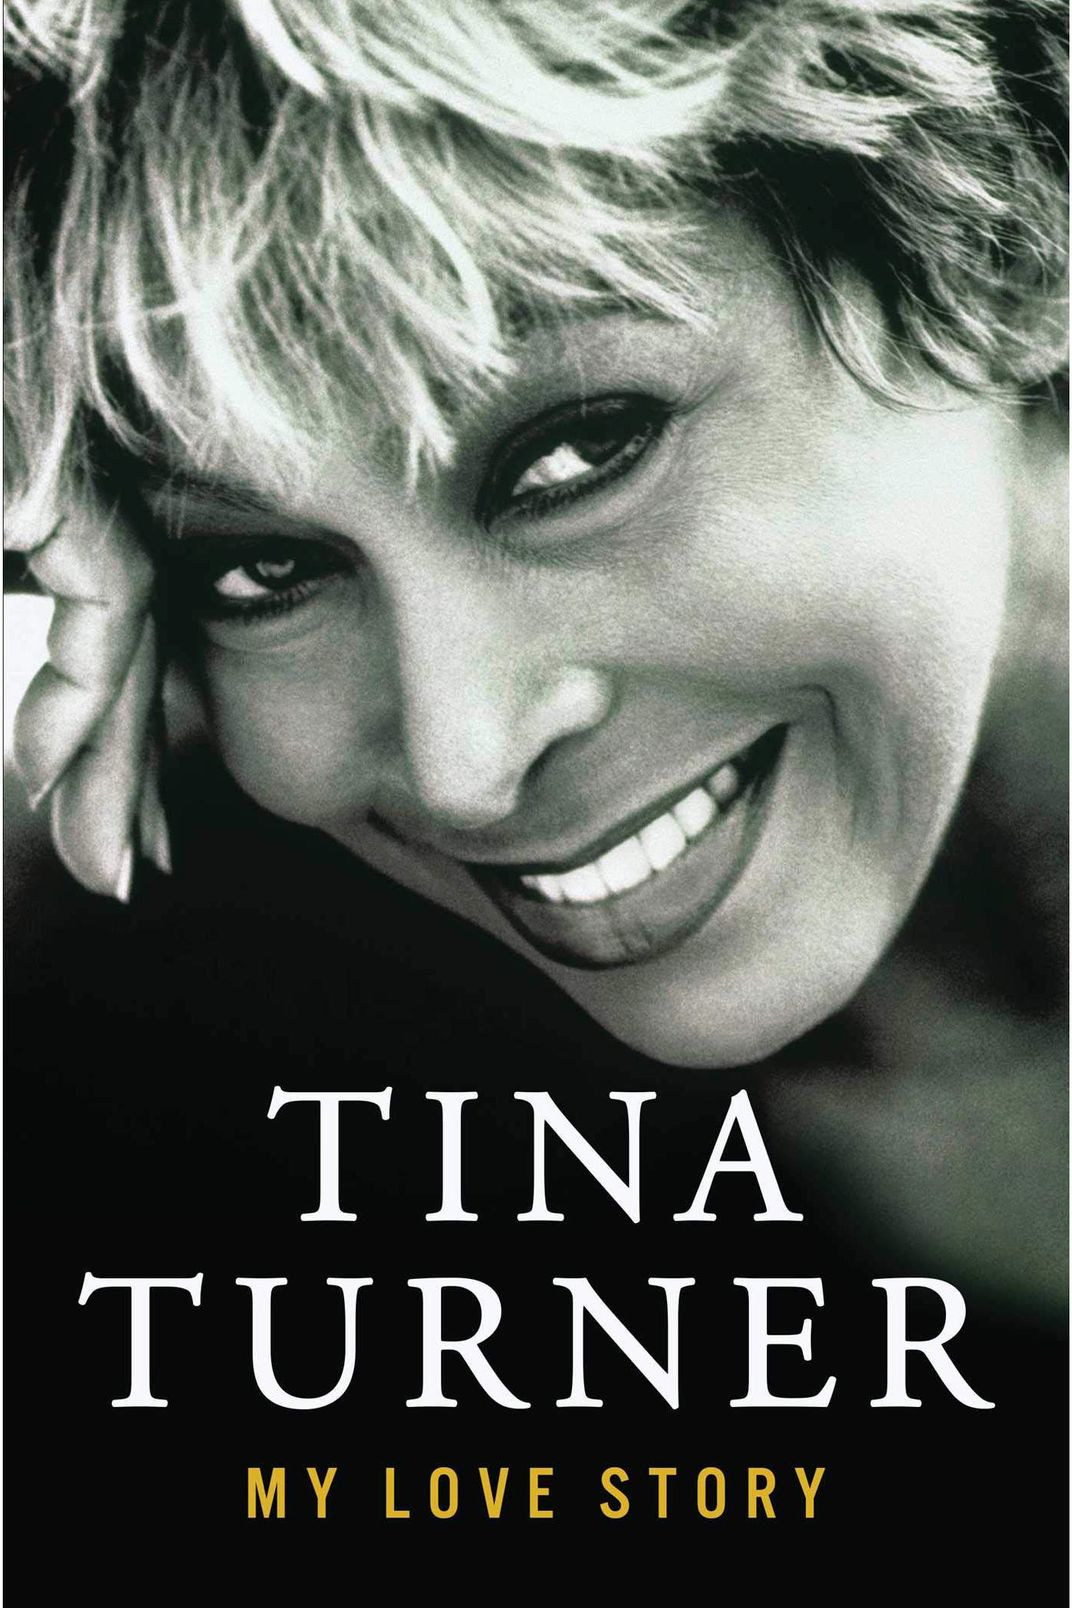 My Love Story, by Tina Turner (Atria Books, Oct. 16)